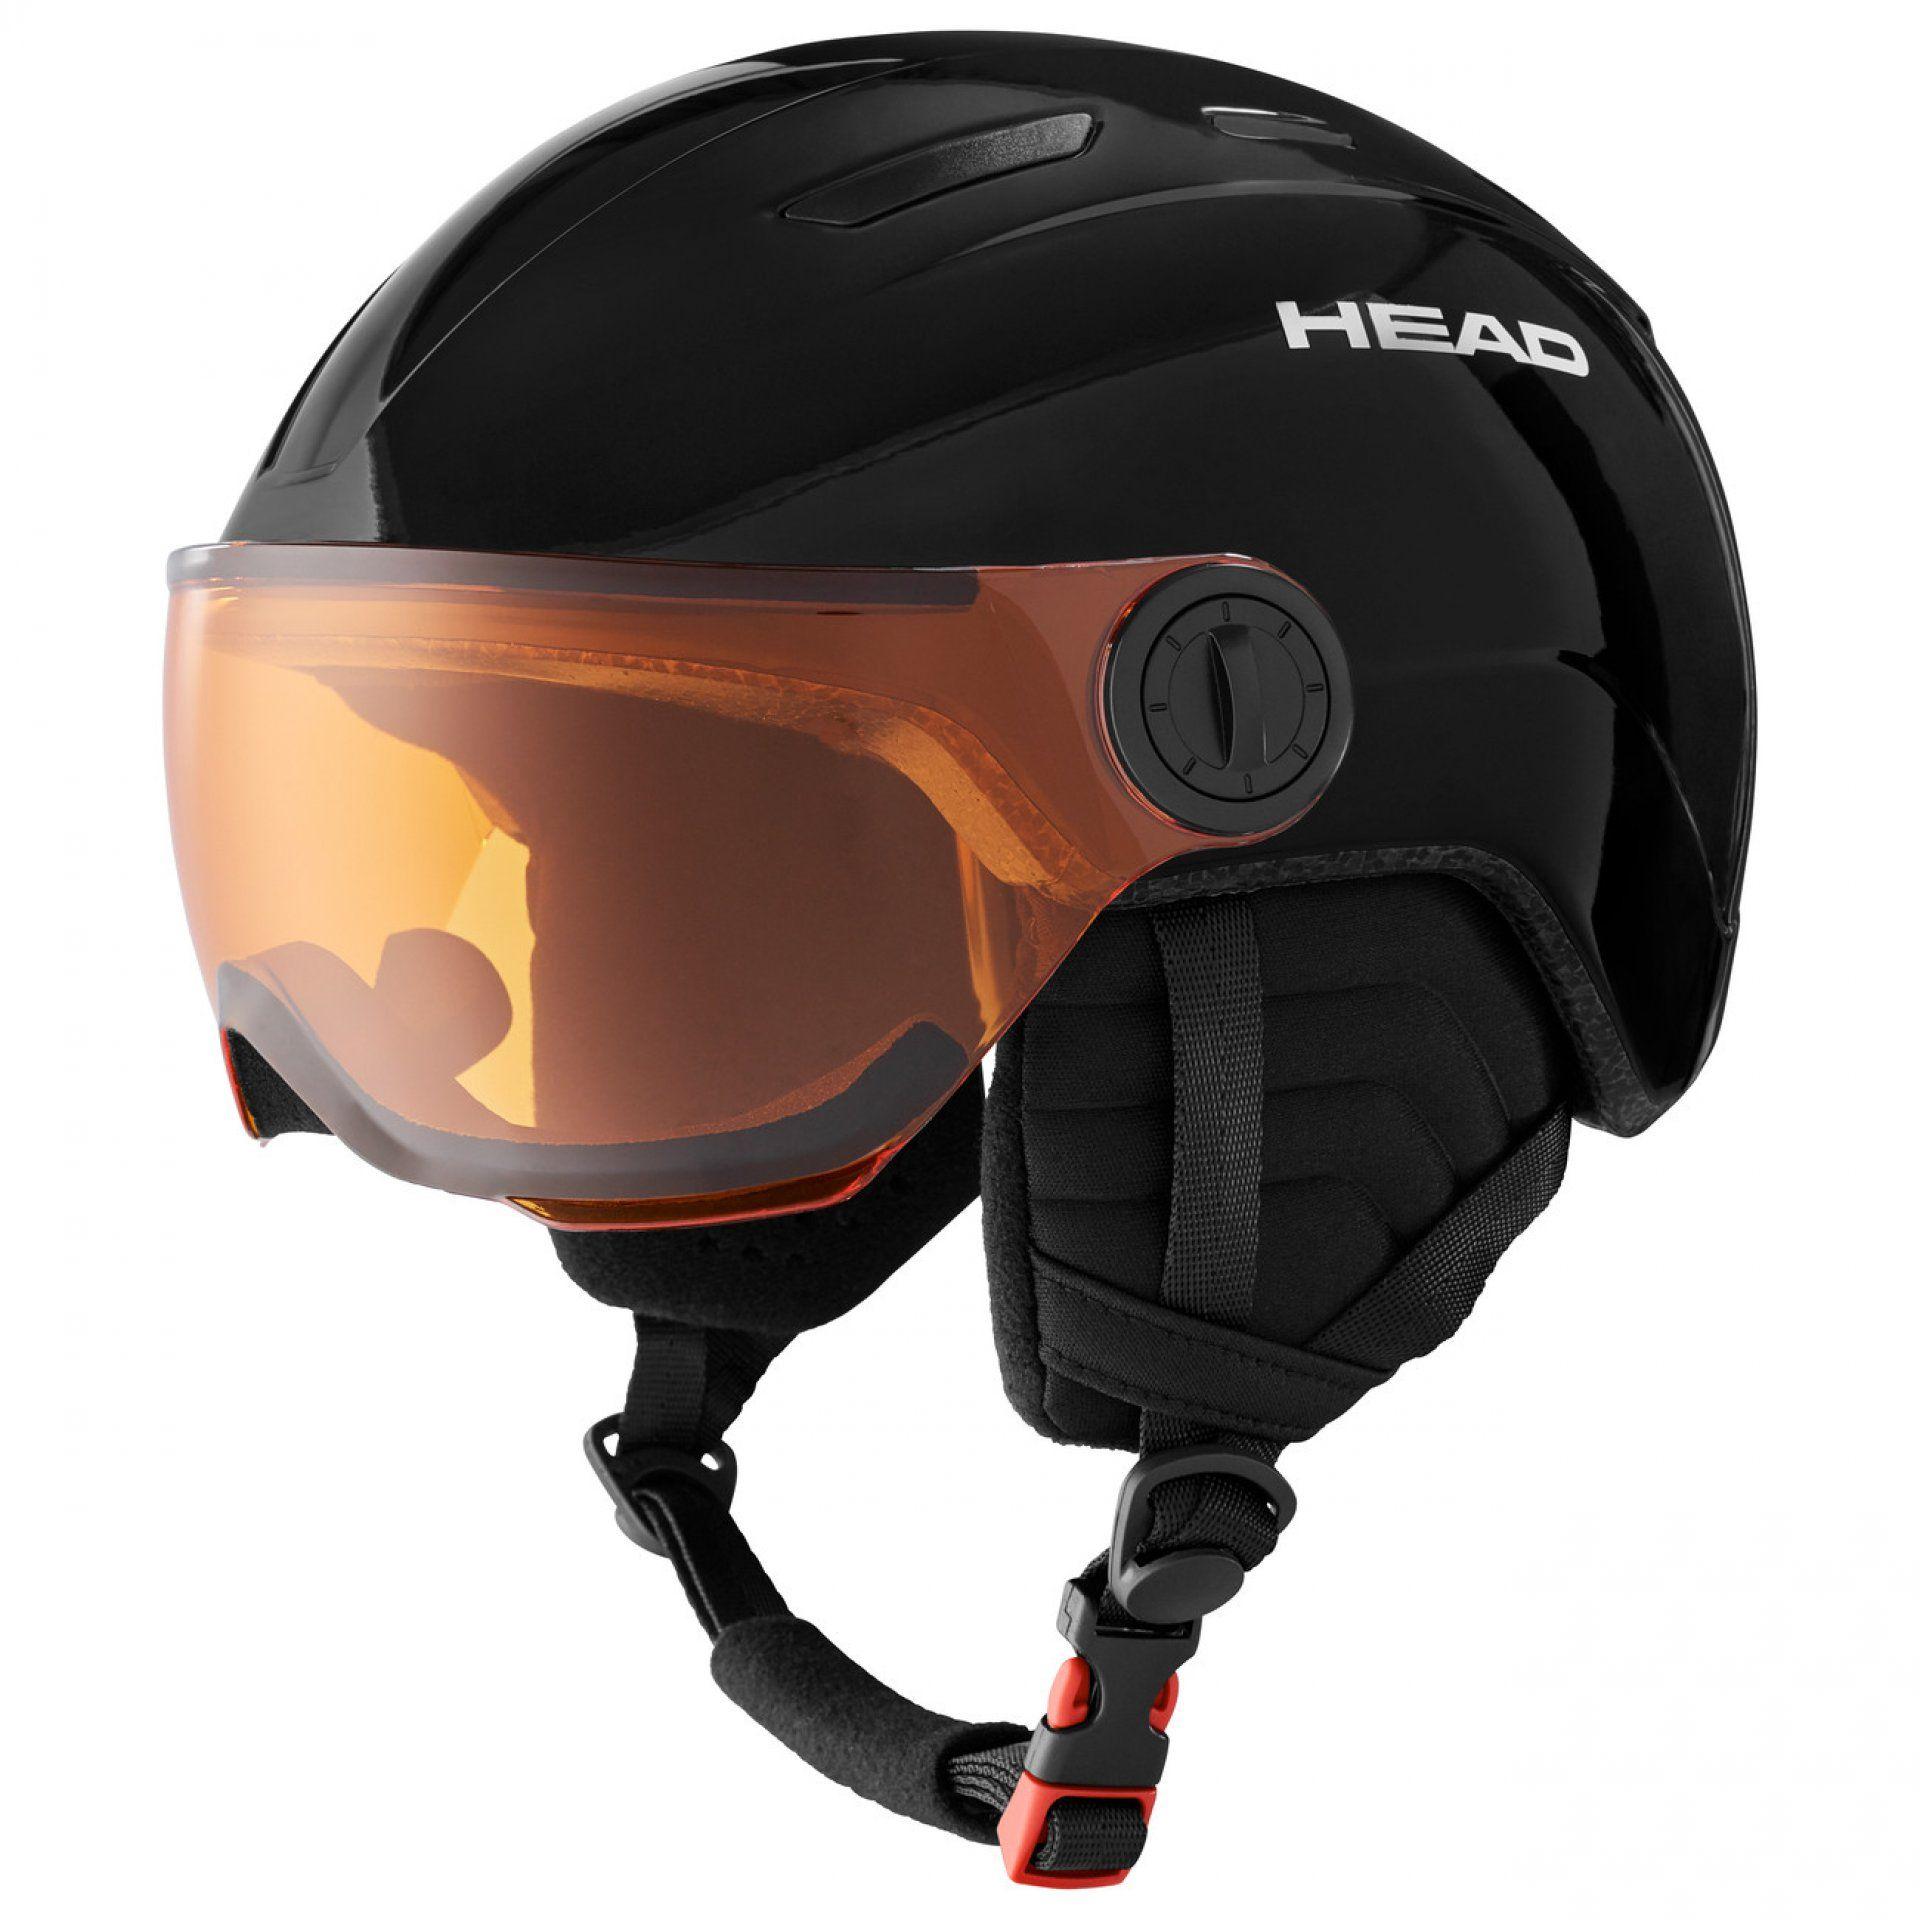 KASK HEAD MOJO VISOR 328140 BLACK